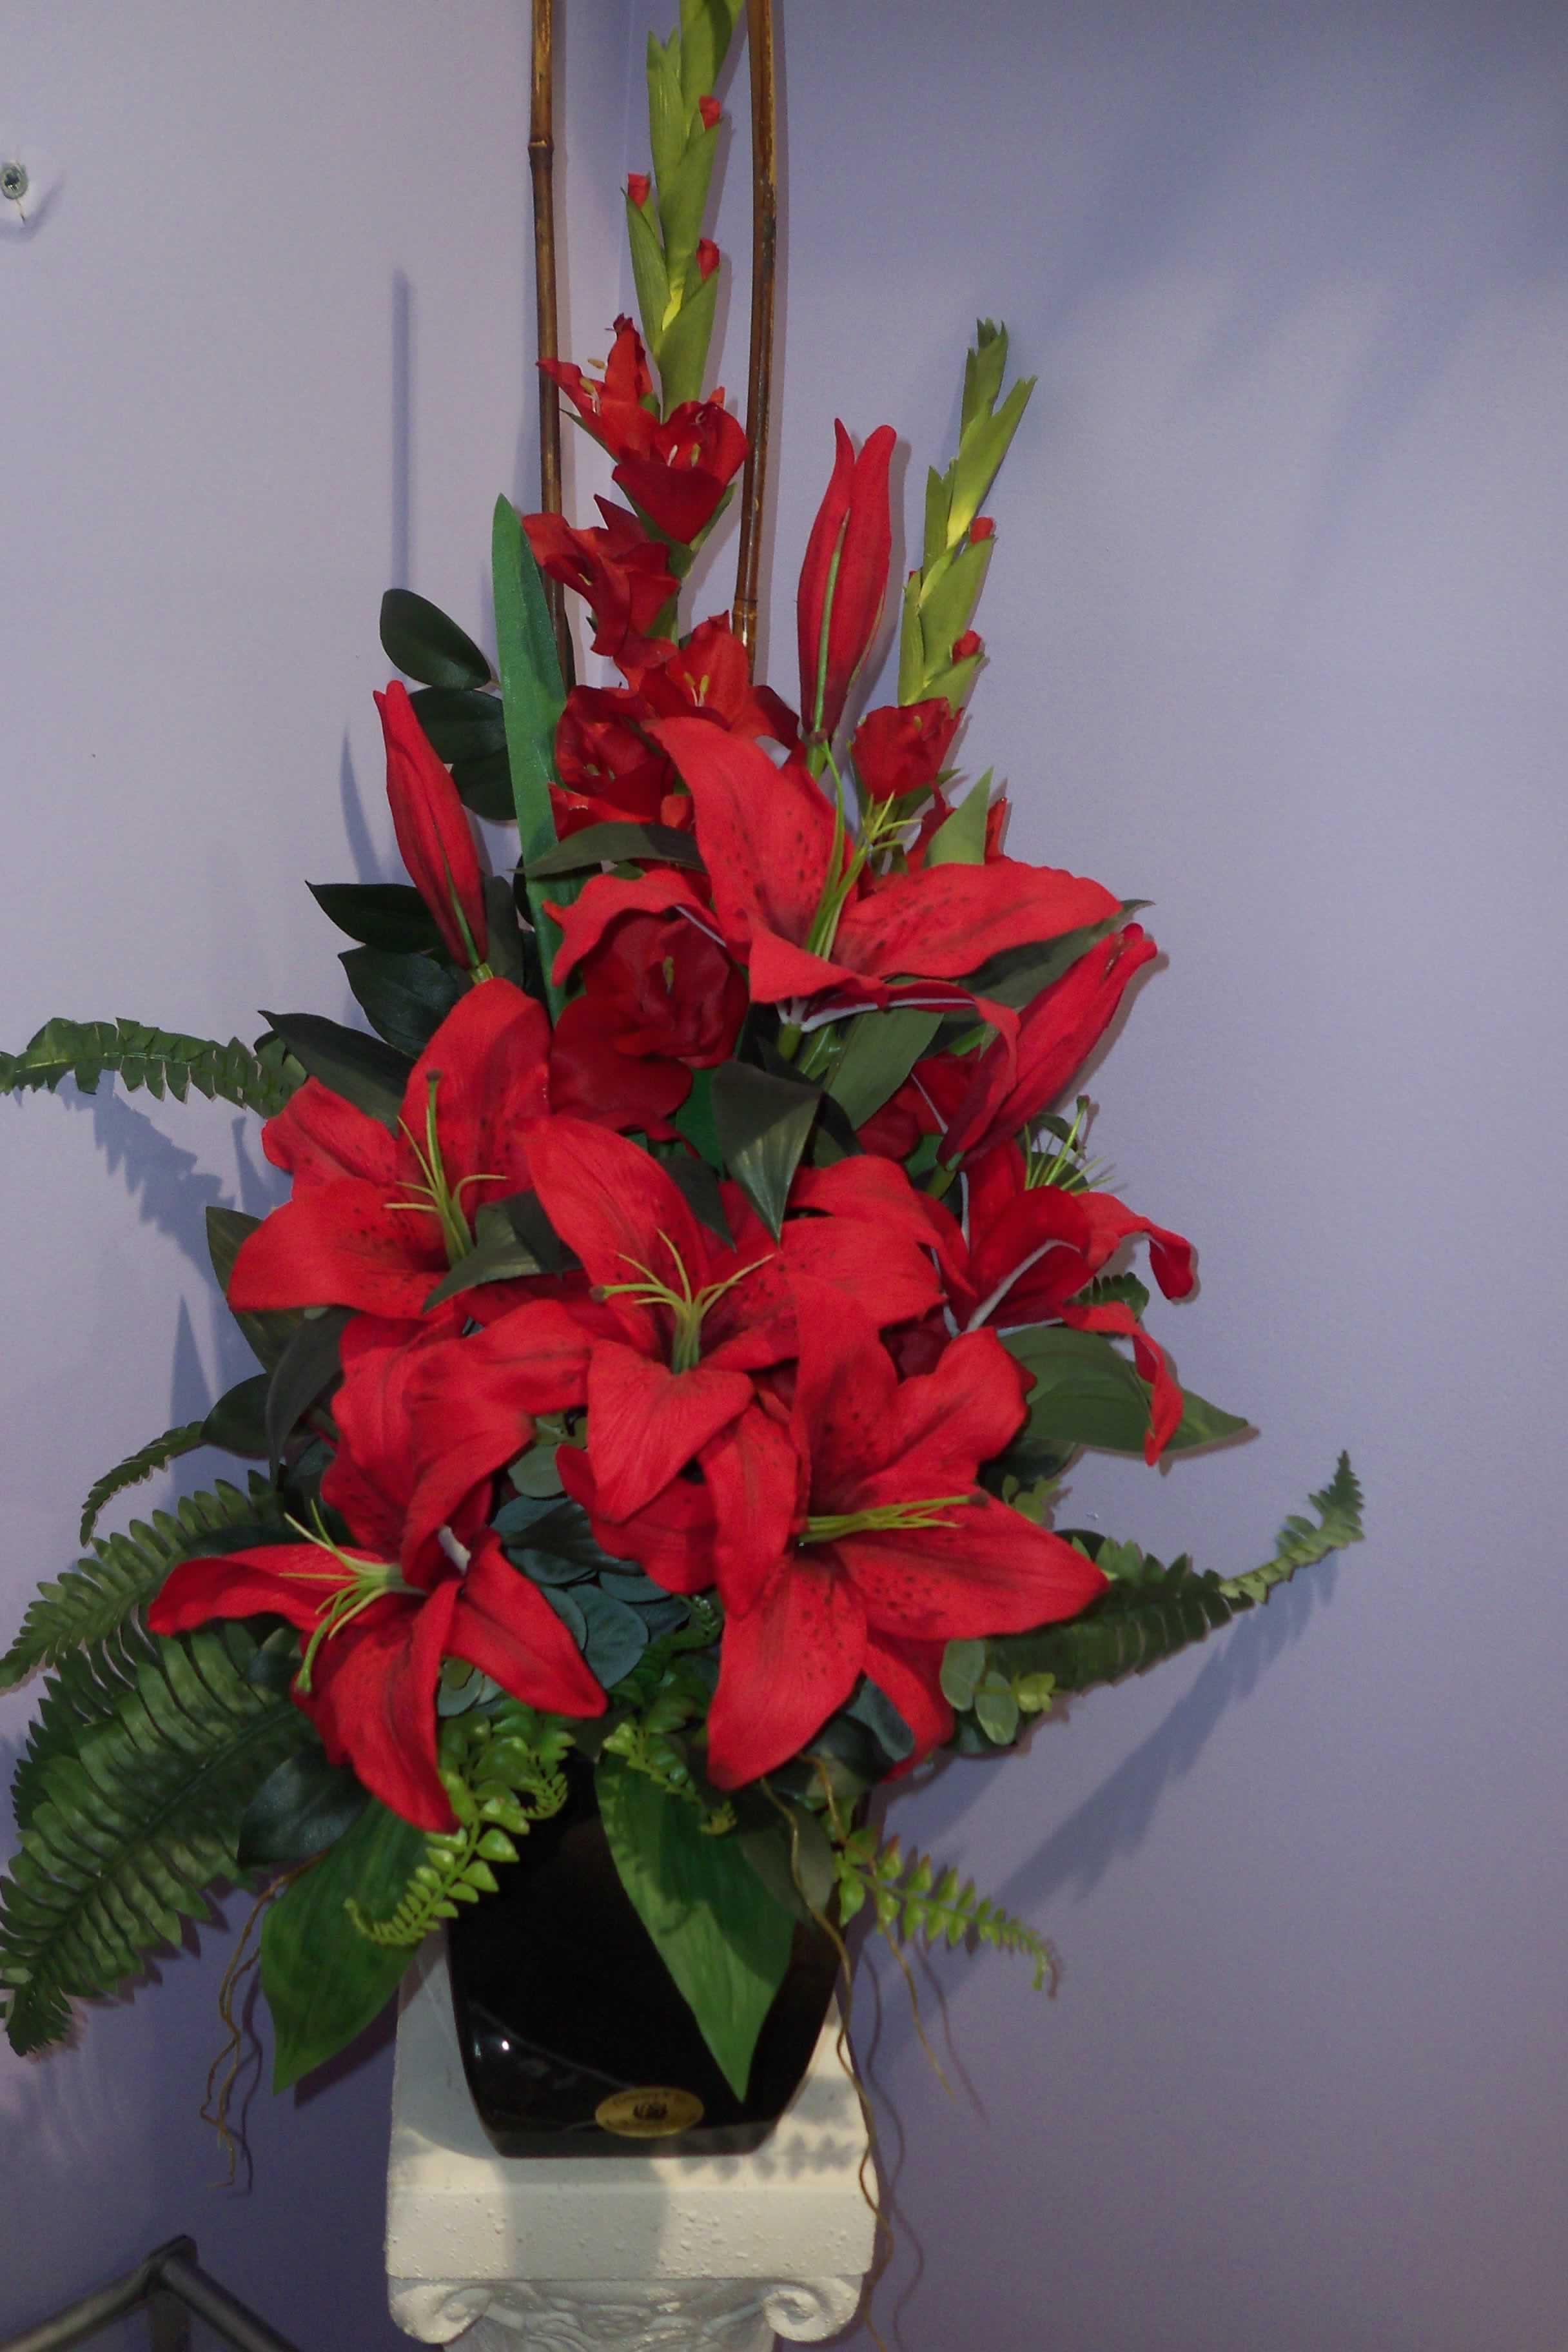 Silk red lilly stunning arrangement flowers r us silk red lilly stunning arrangement mightylinksfo